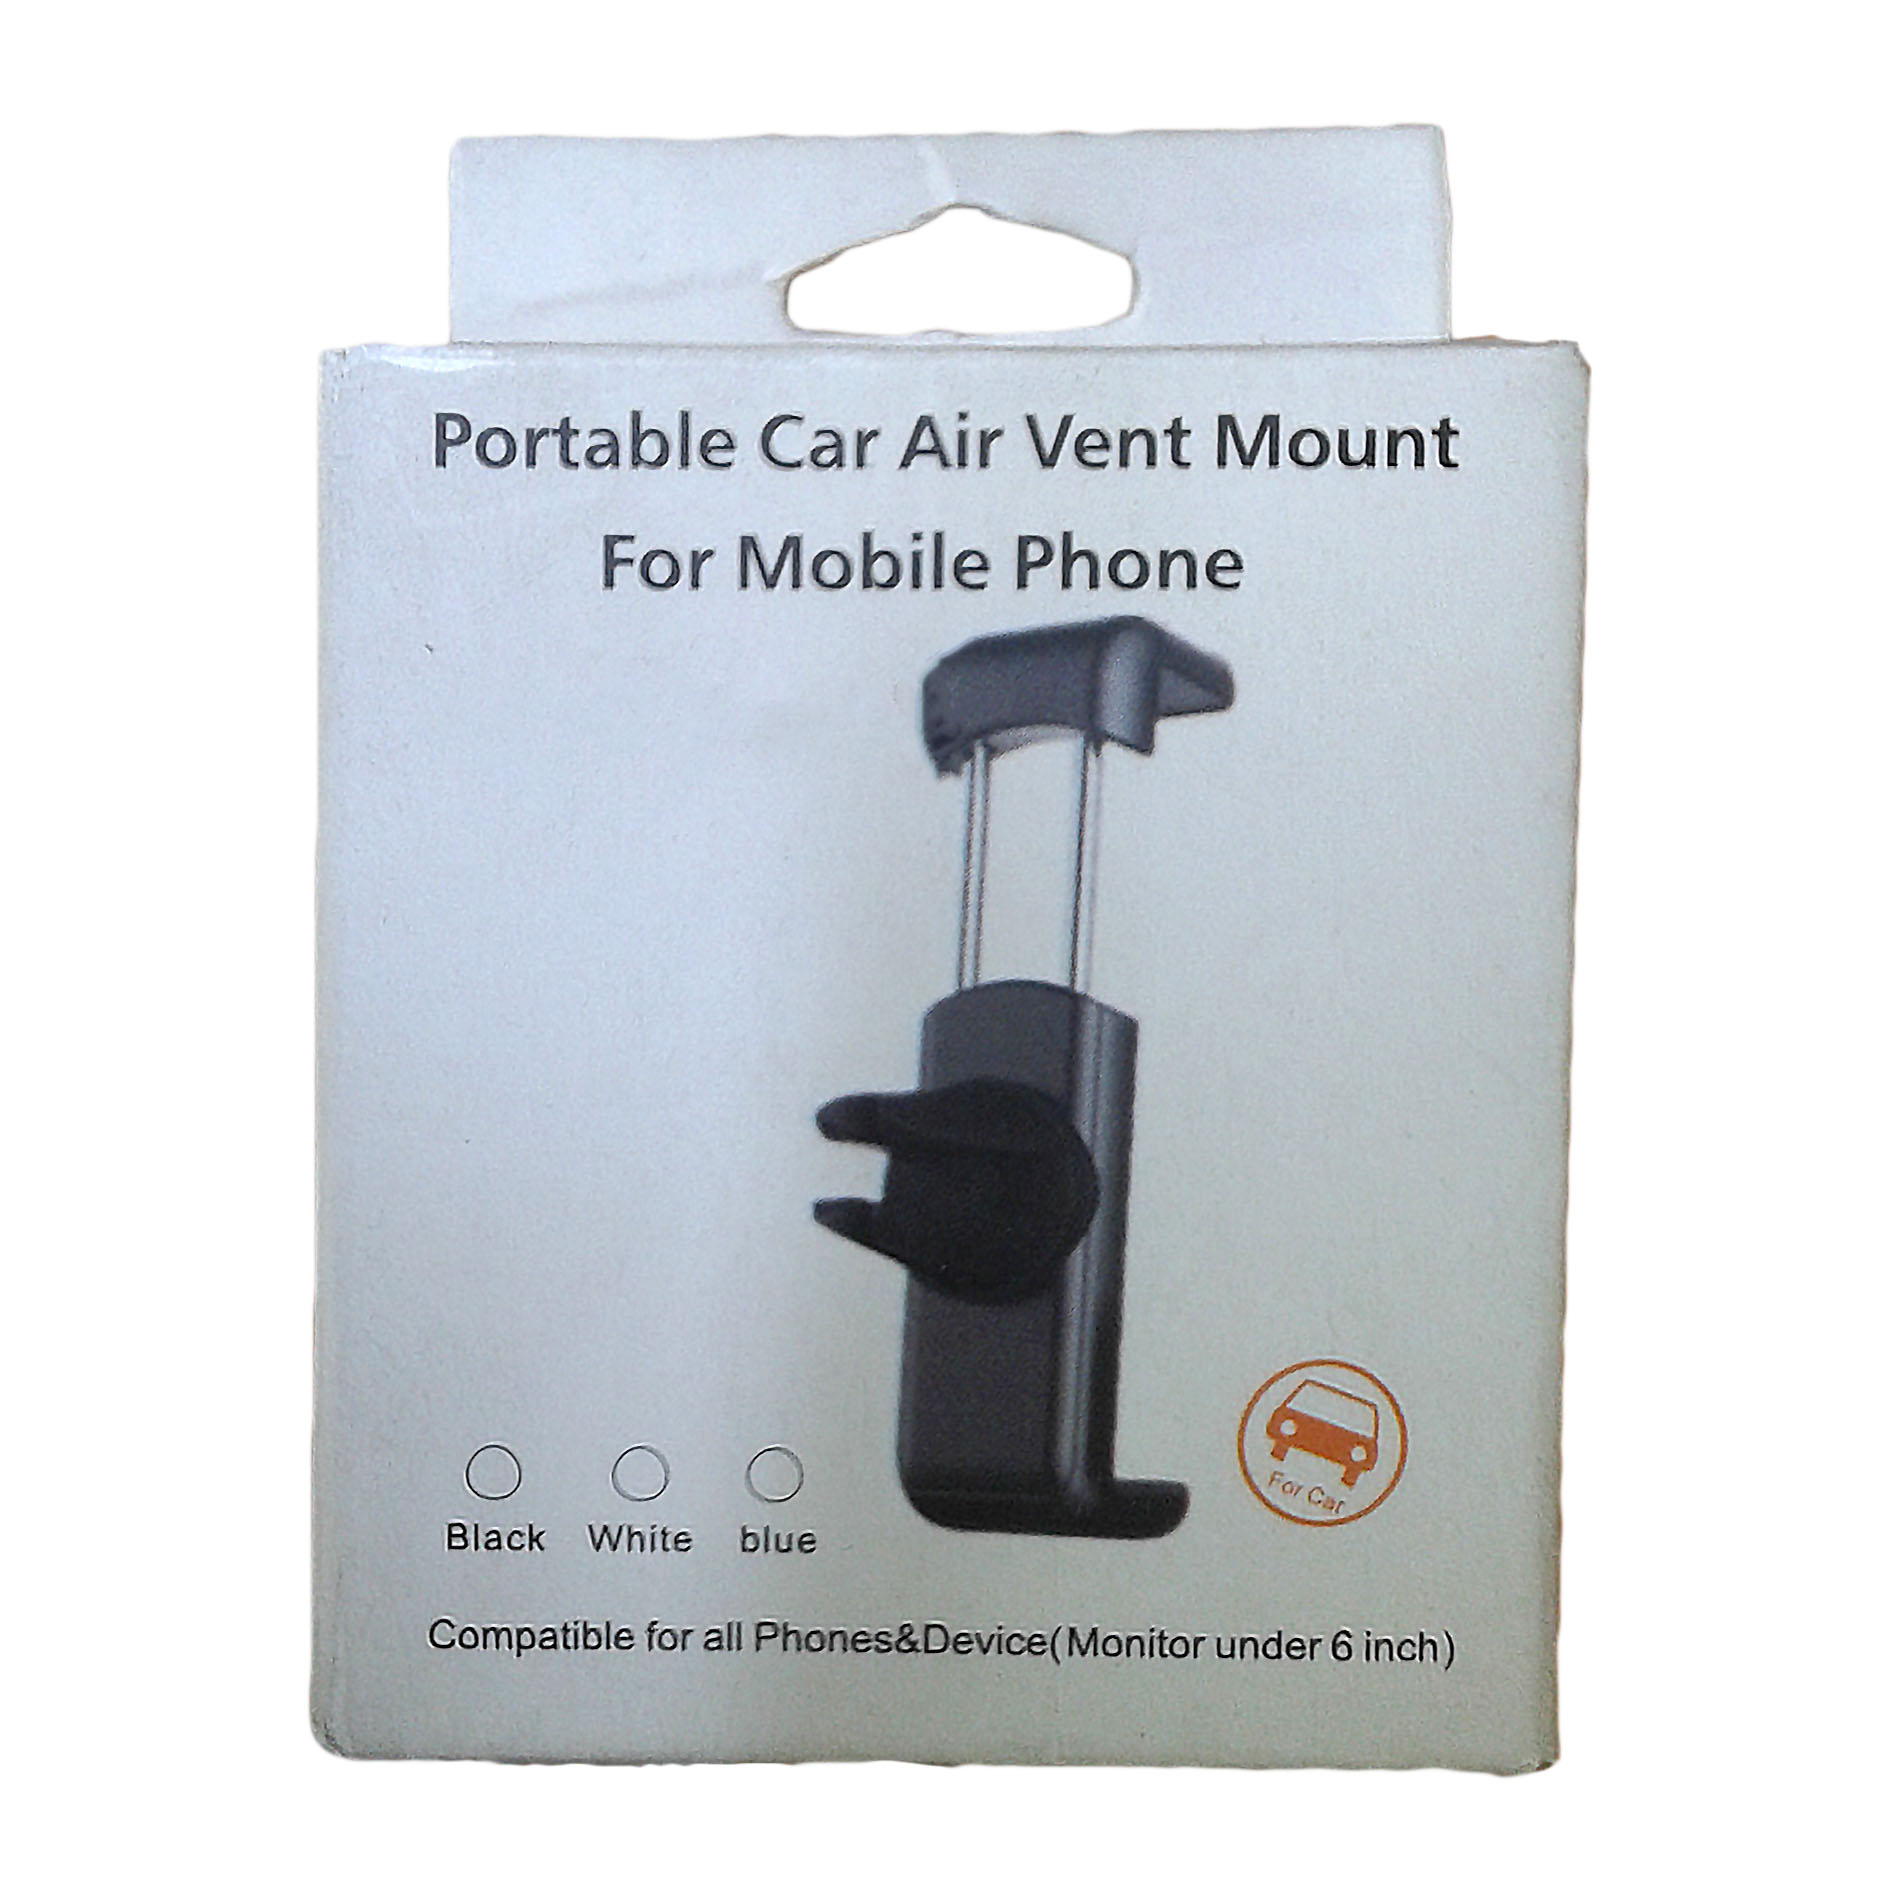 SMART PHONE CAR HOLDER - هولدر موبايل للسيارة على المكيف ,Other Smartphone Acc